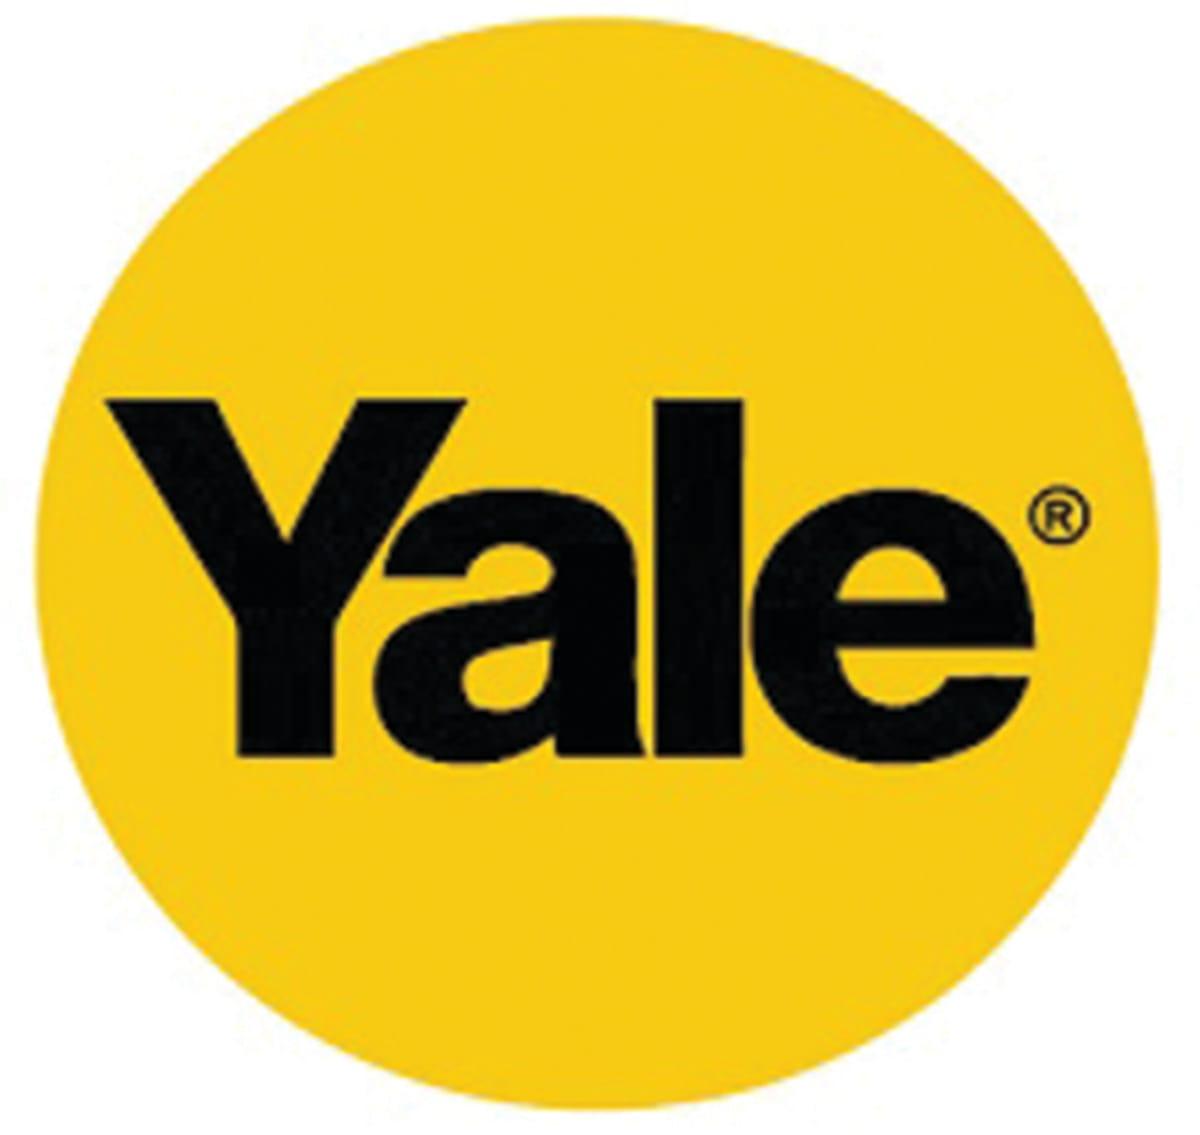 MC_Yale